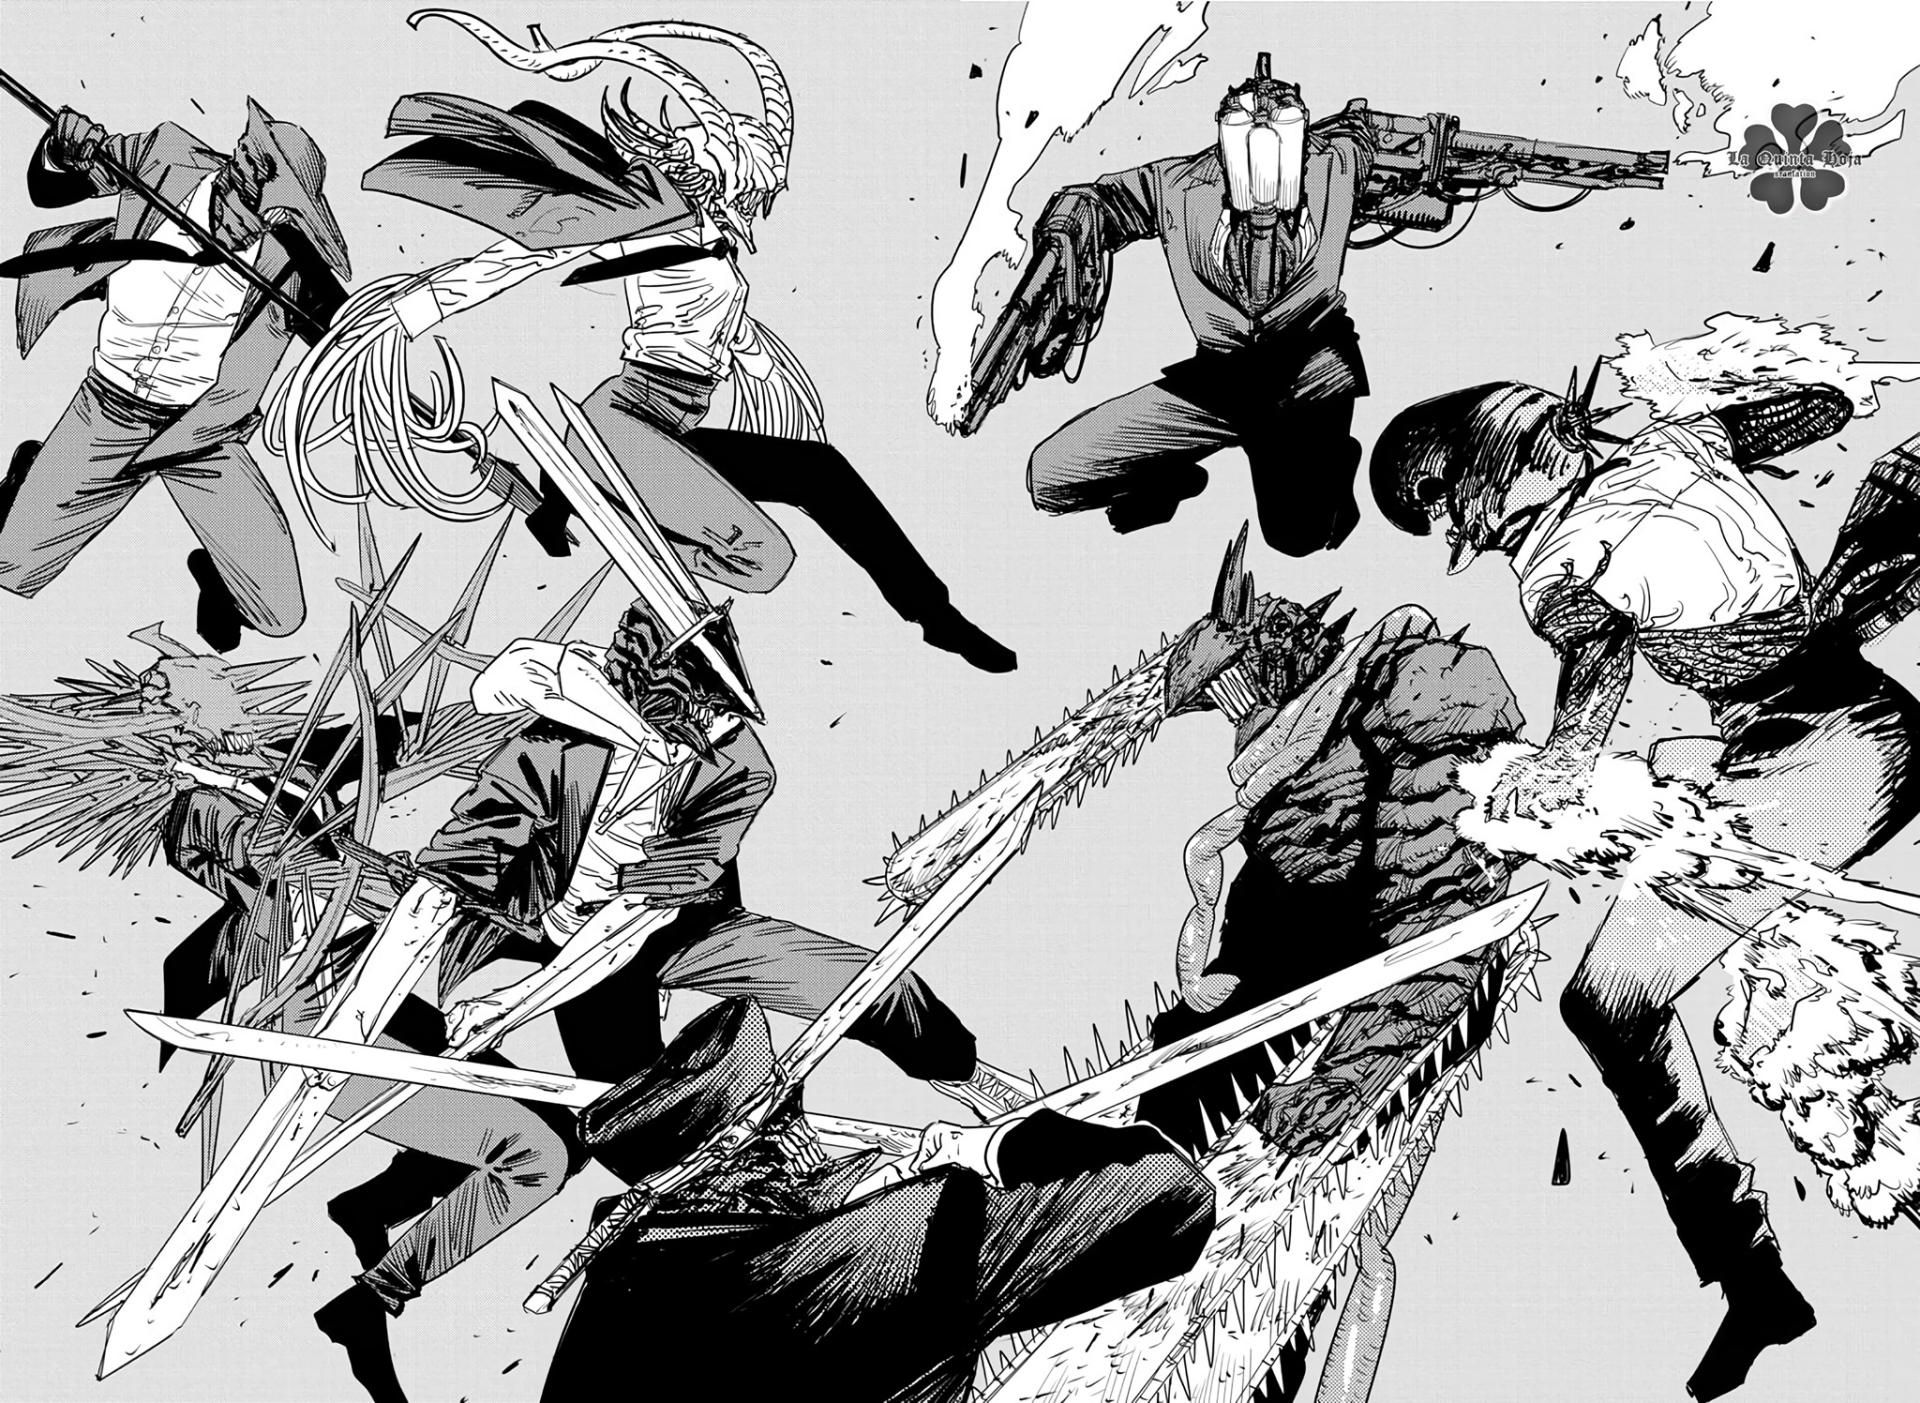 Chainsaw Man Cap. 87 - Pág. 3: Motosierra vs las horripilantes armas  humanas - Mangas.in | Chainsaw, Manga art, Manga anime one piece